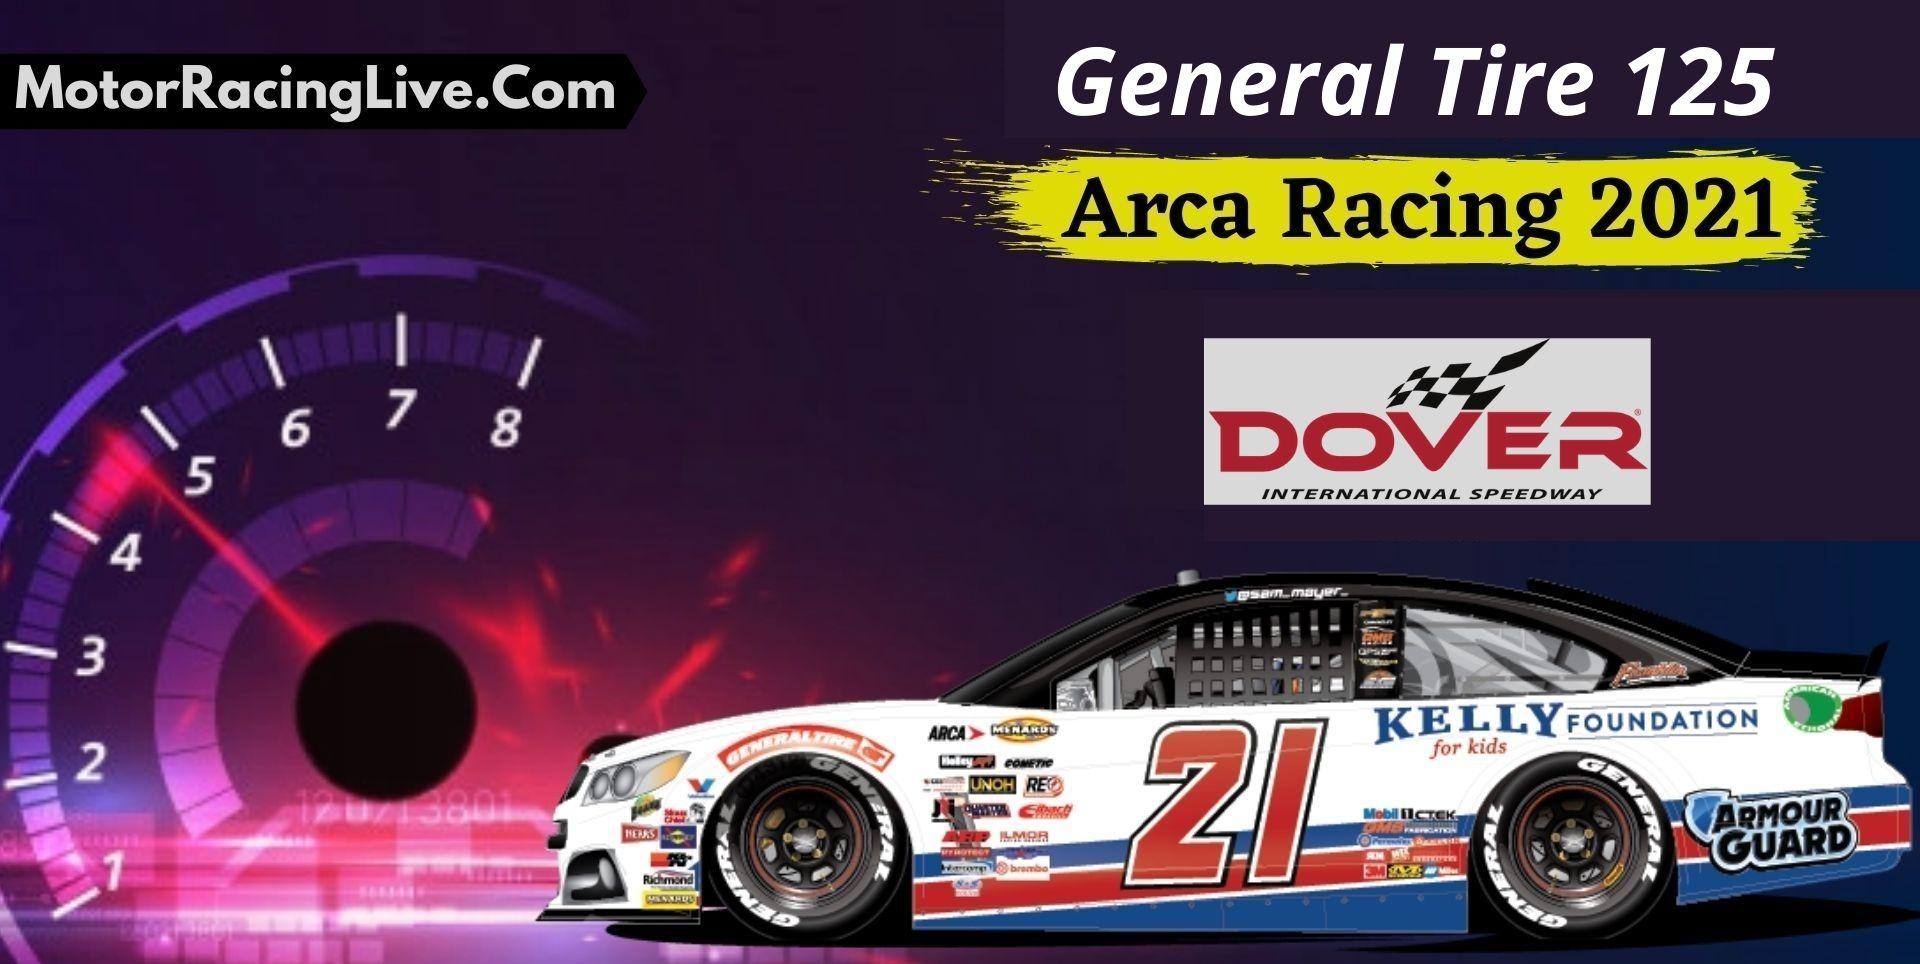 General Tire 125 Live Stream ARCA Racing 2021